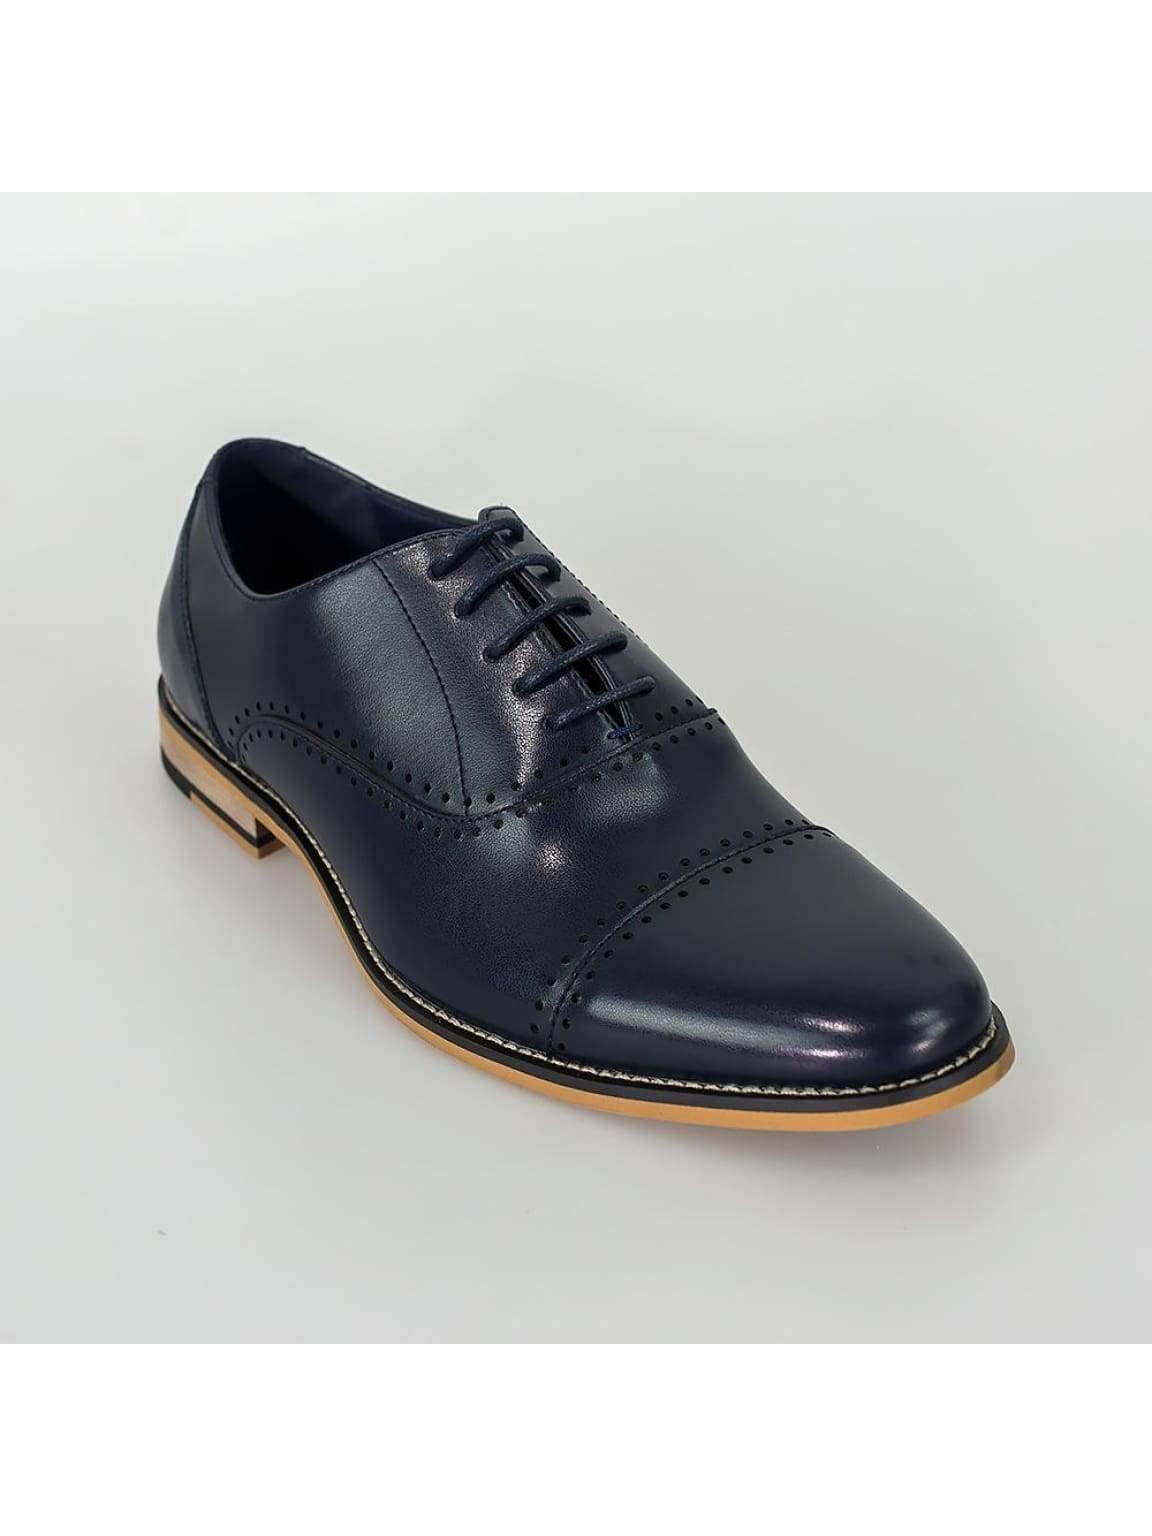 Cavani Alberto Mens Navy Leather Shoes - Shoes